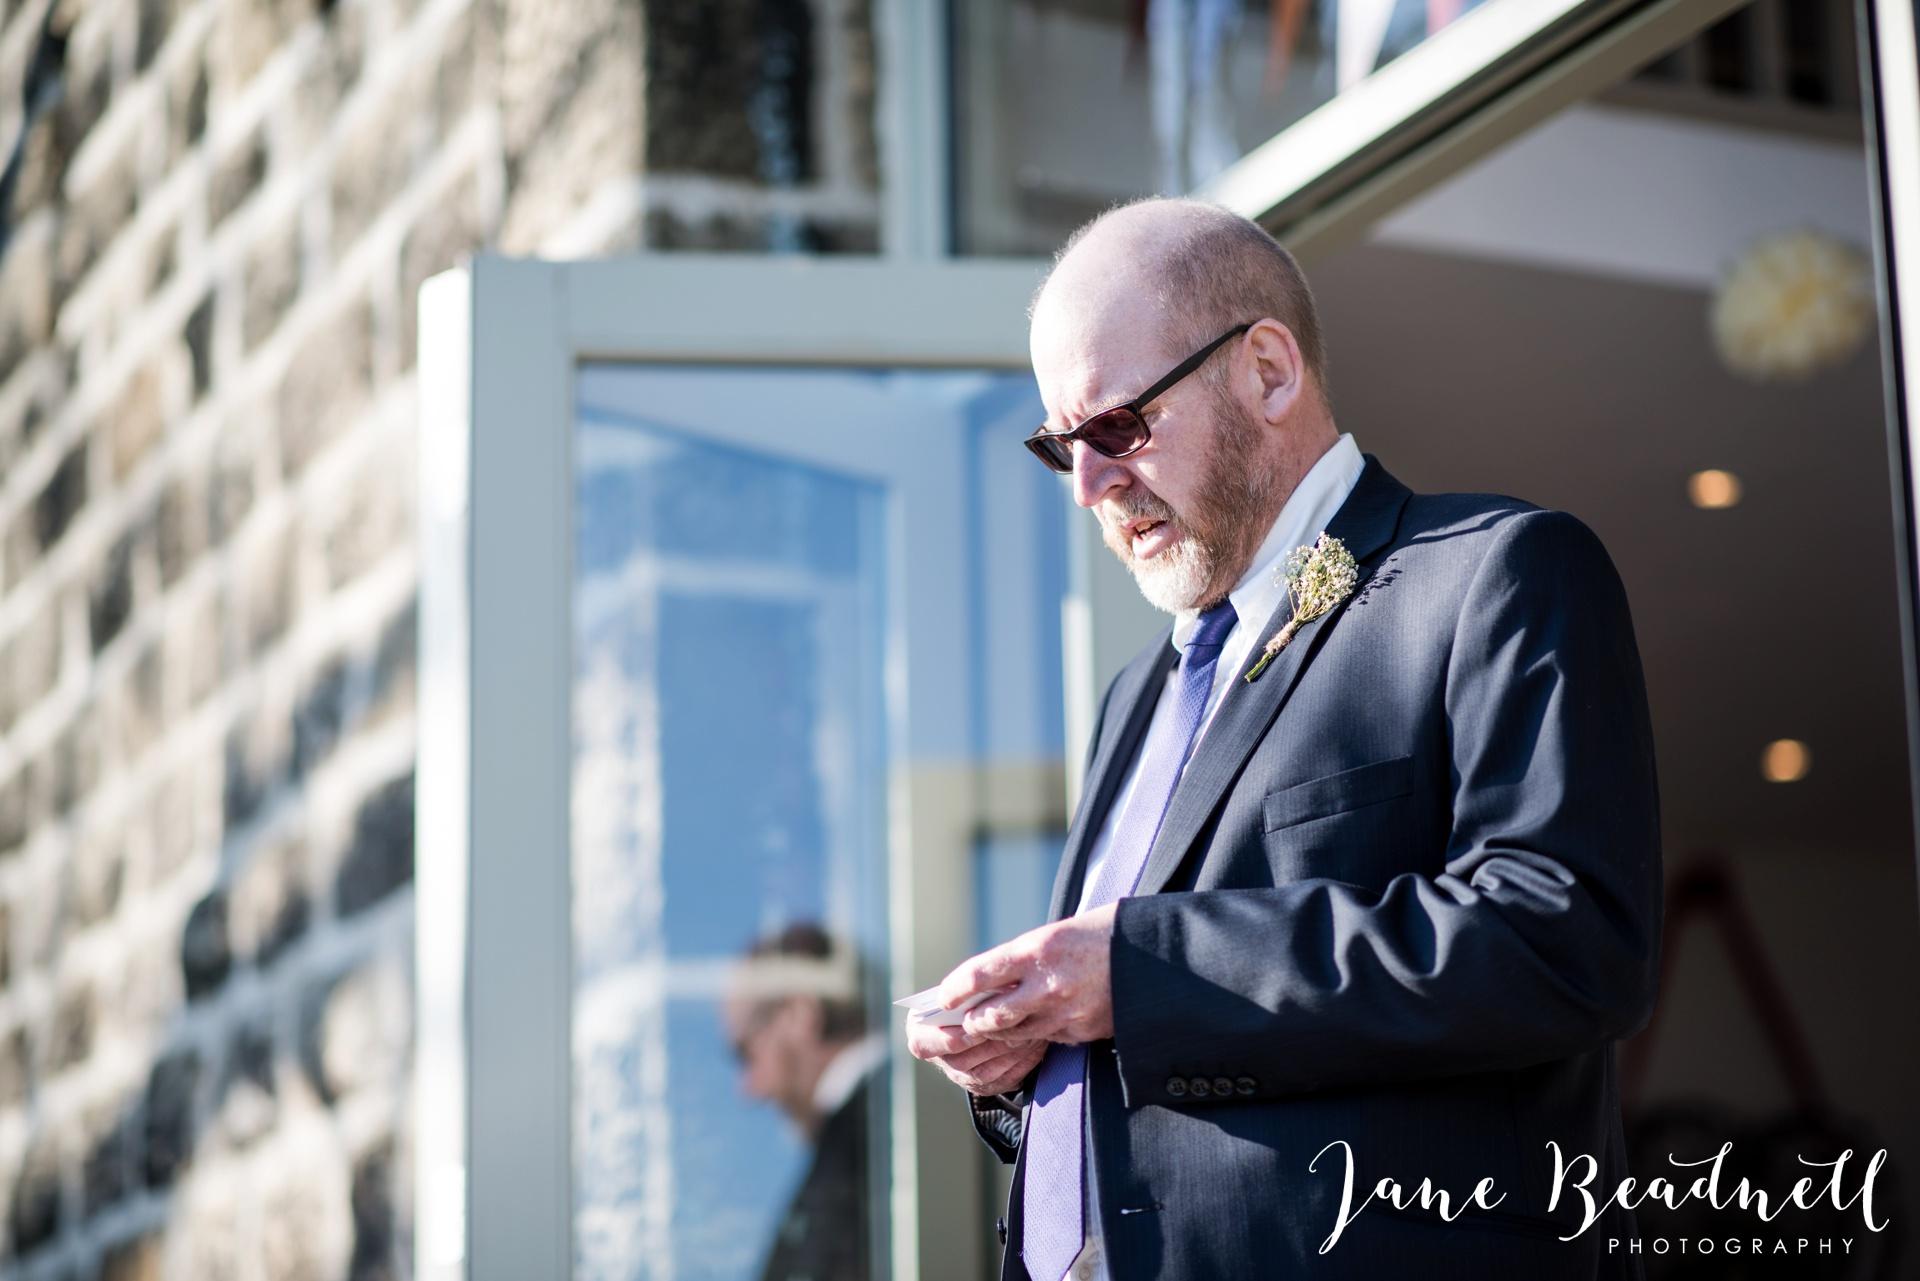 Jane Beadnell fine art wedding photographer The Cheerful Chilli Barn Otley_0040